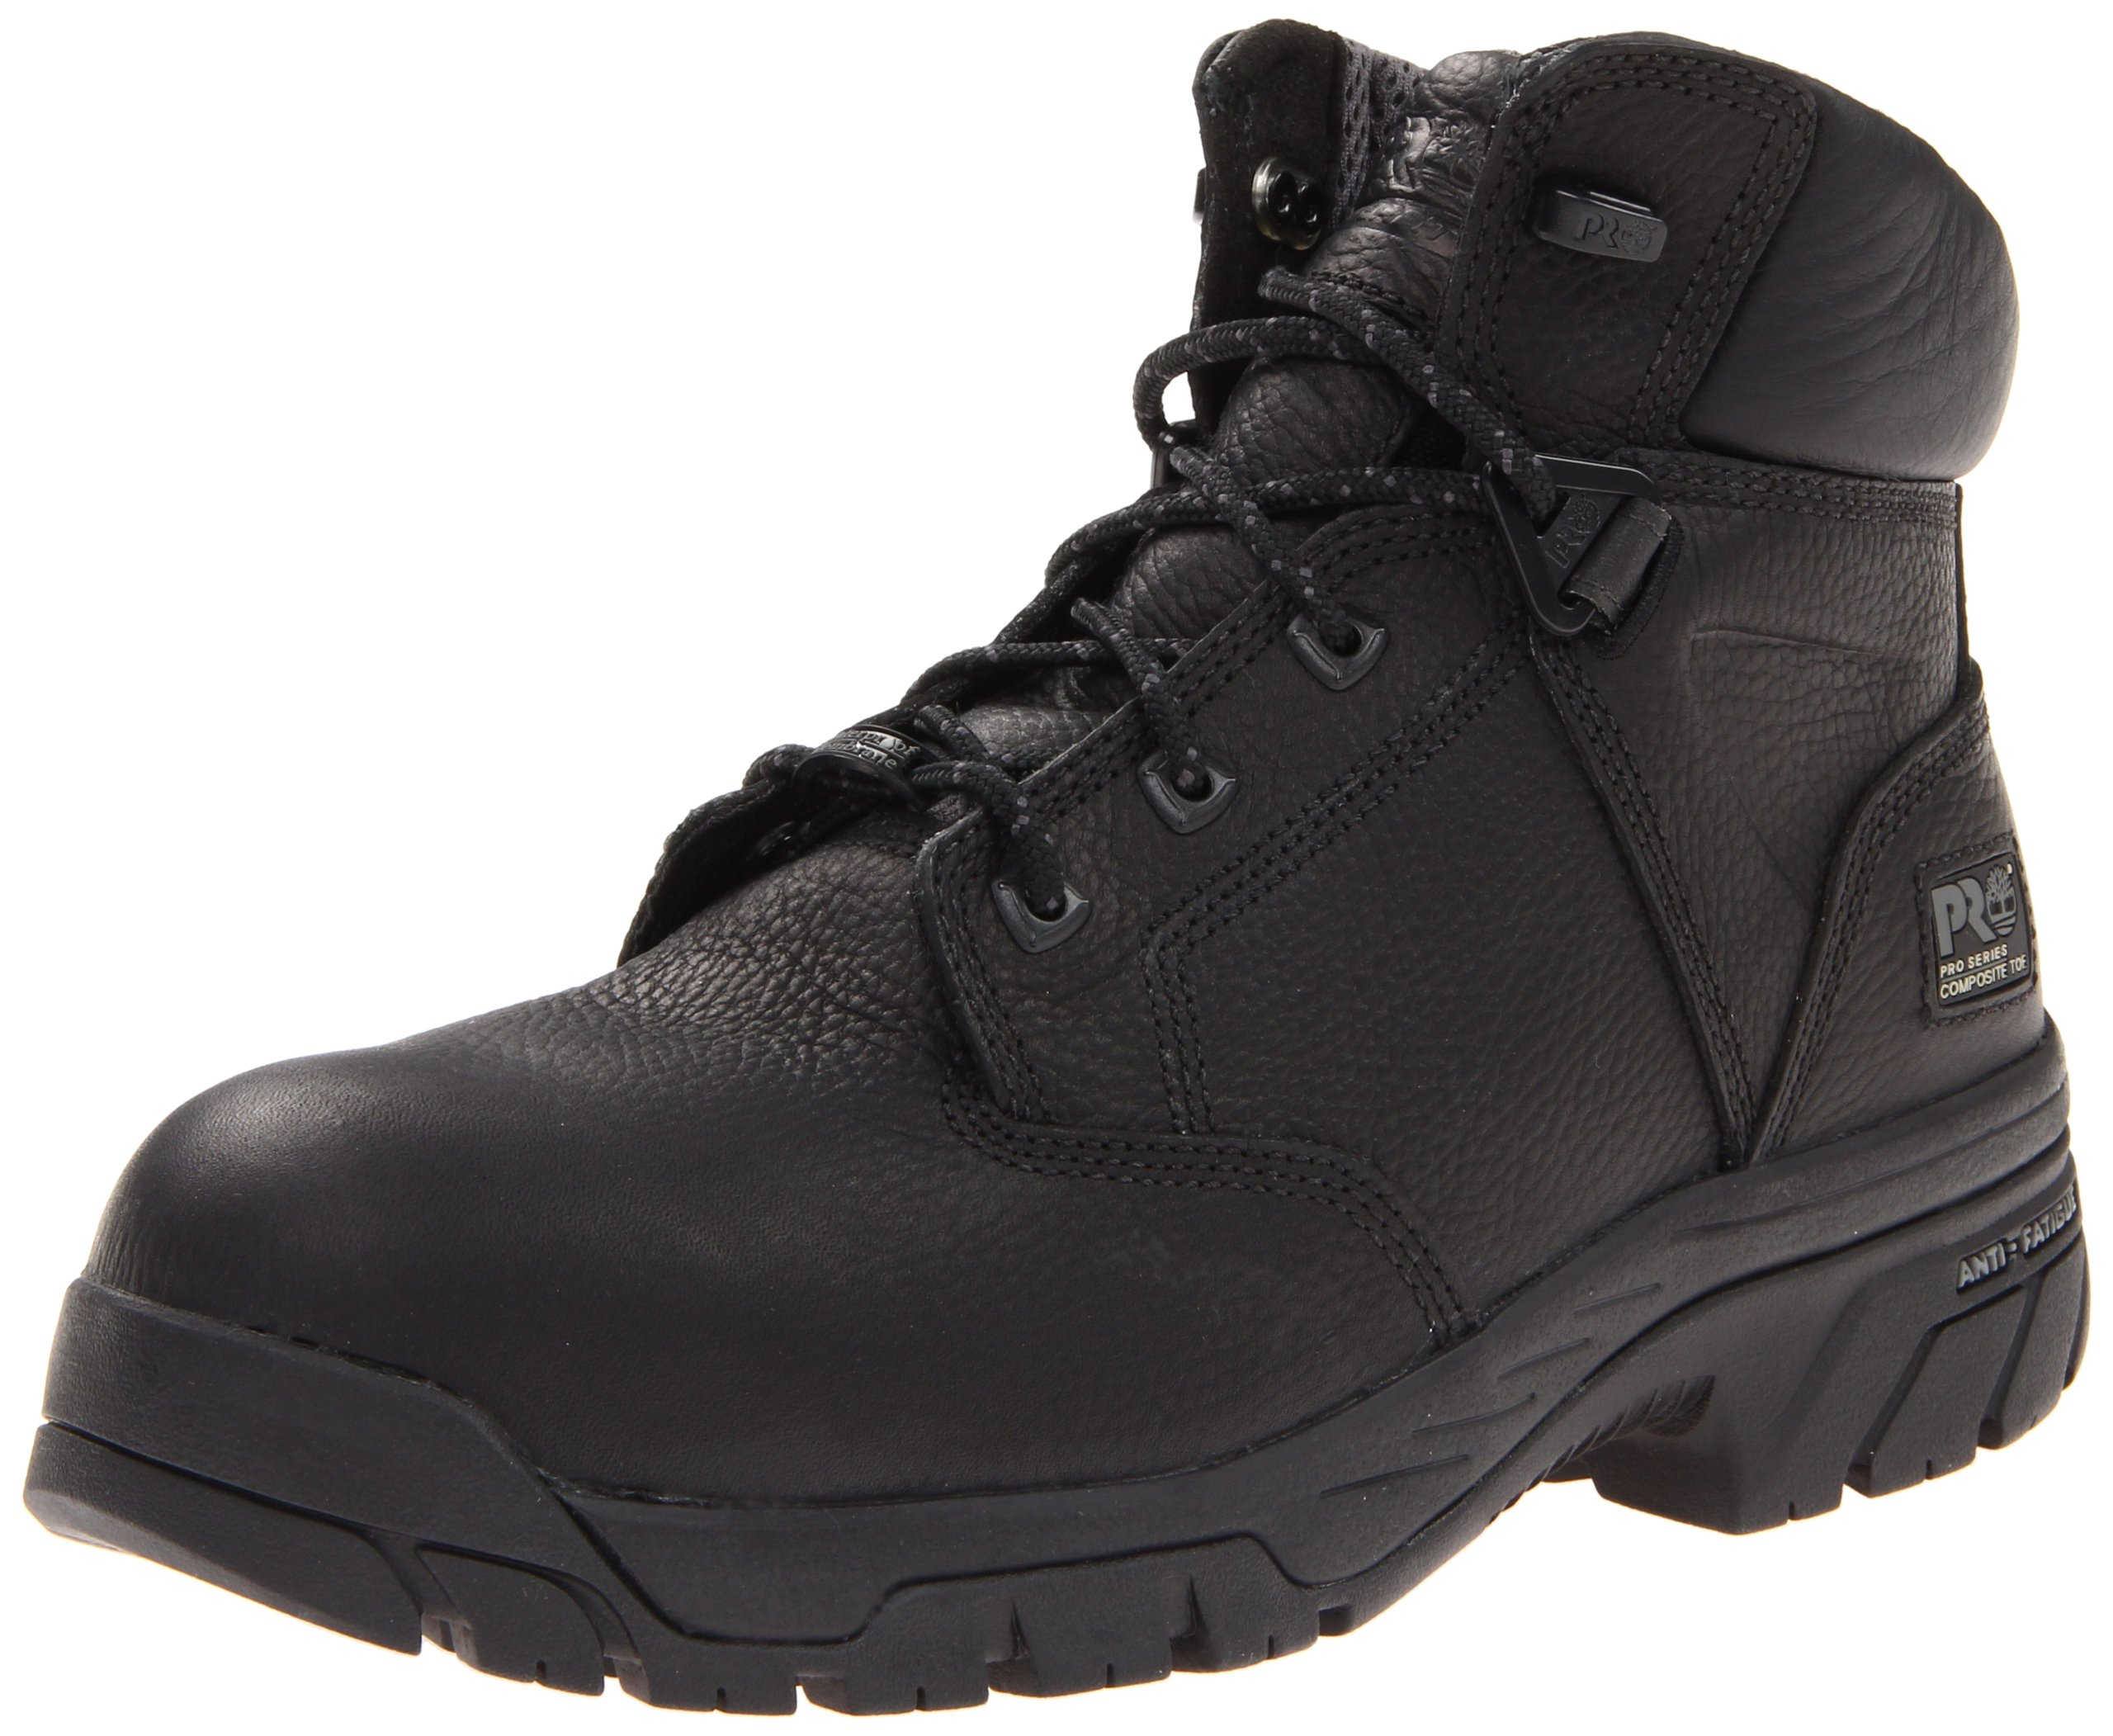 Timberland PRO Men's Helix 6-Inch Waterproof BL Comp Lace-Up Fashion Sneaker,Black,7 W US